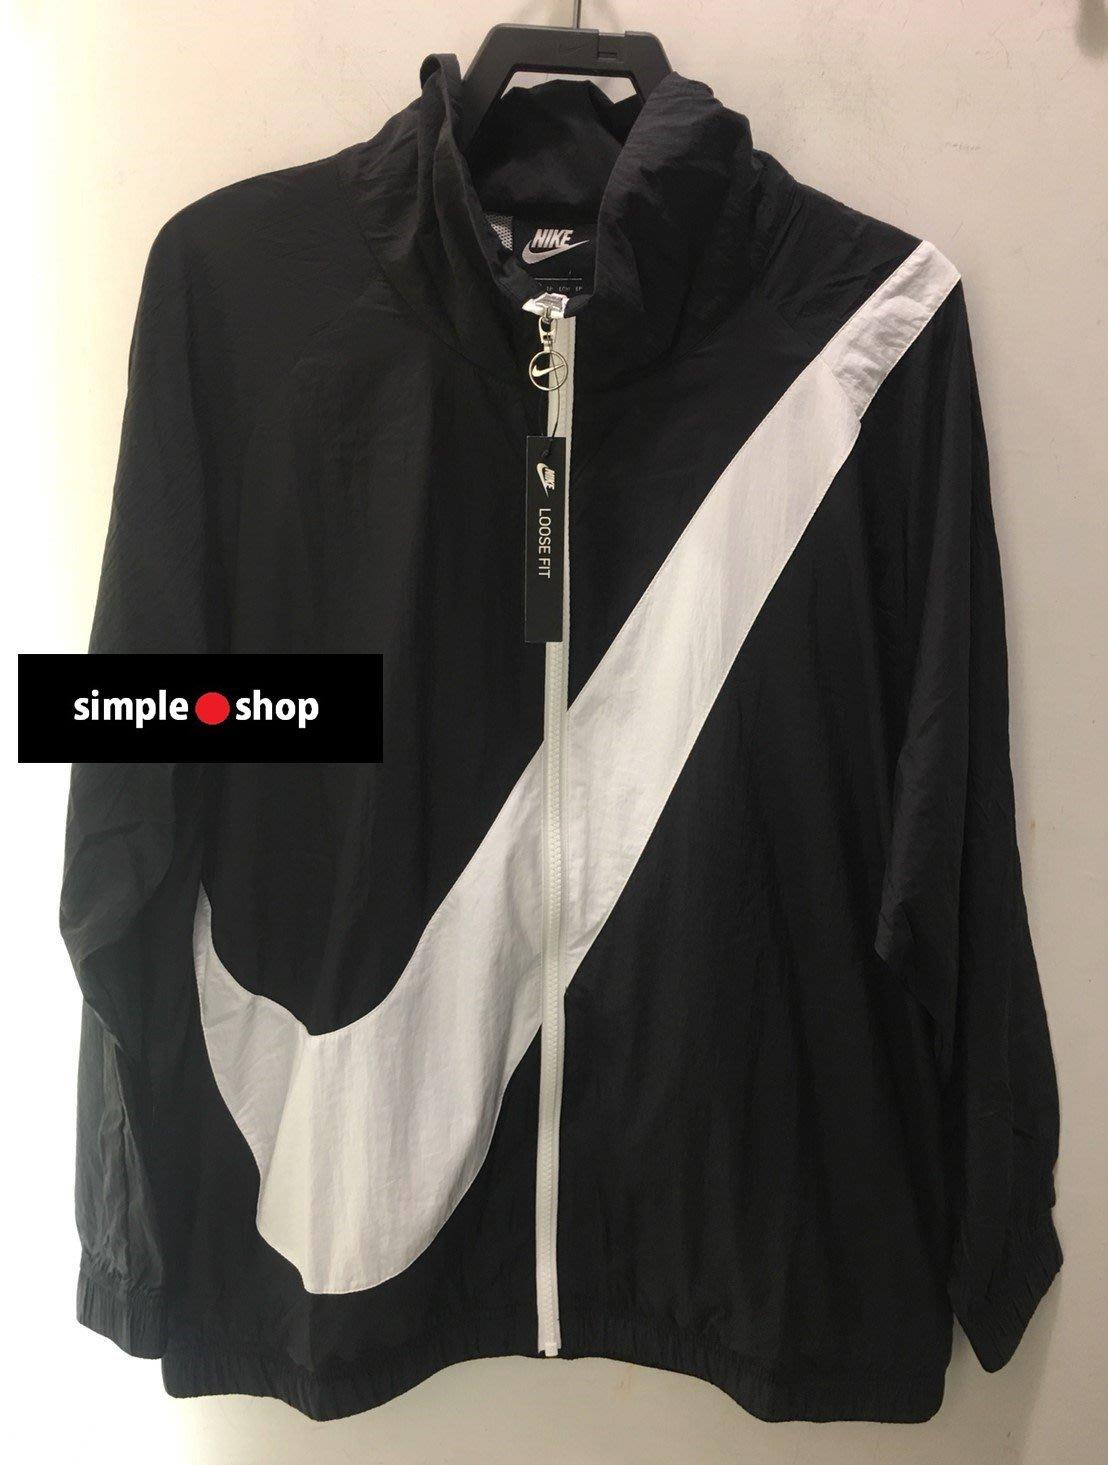 【Simple Shop】NIKE SWOOSH LOGO 大勾外套 風衣 運動外套 慢跑 女款 BV3686-011